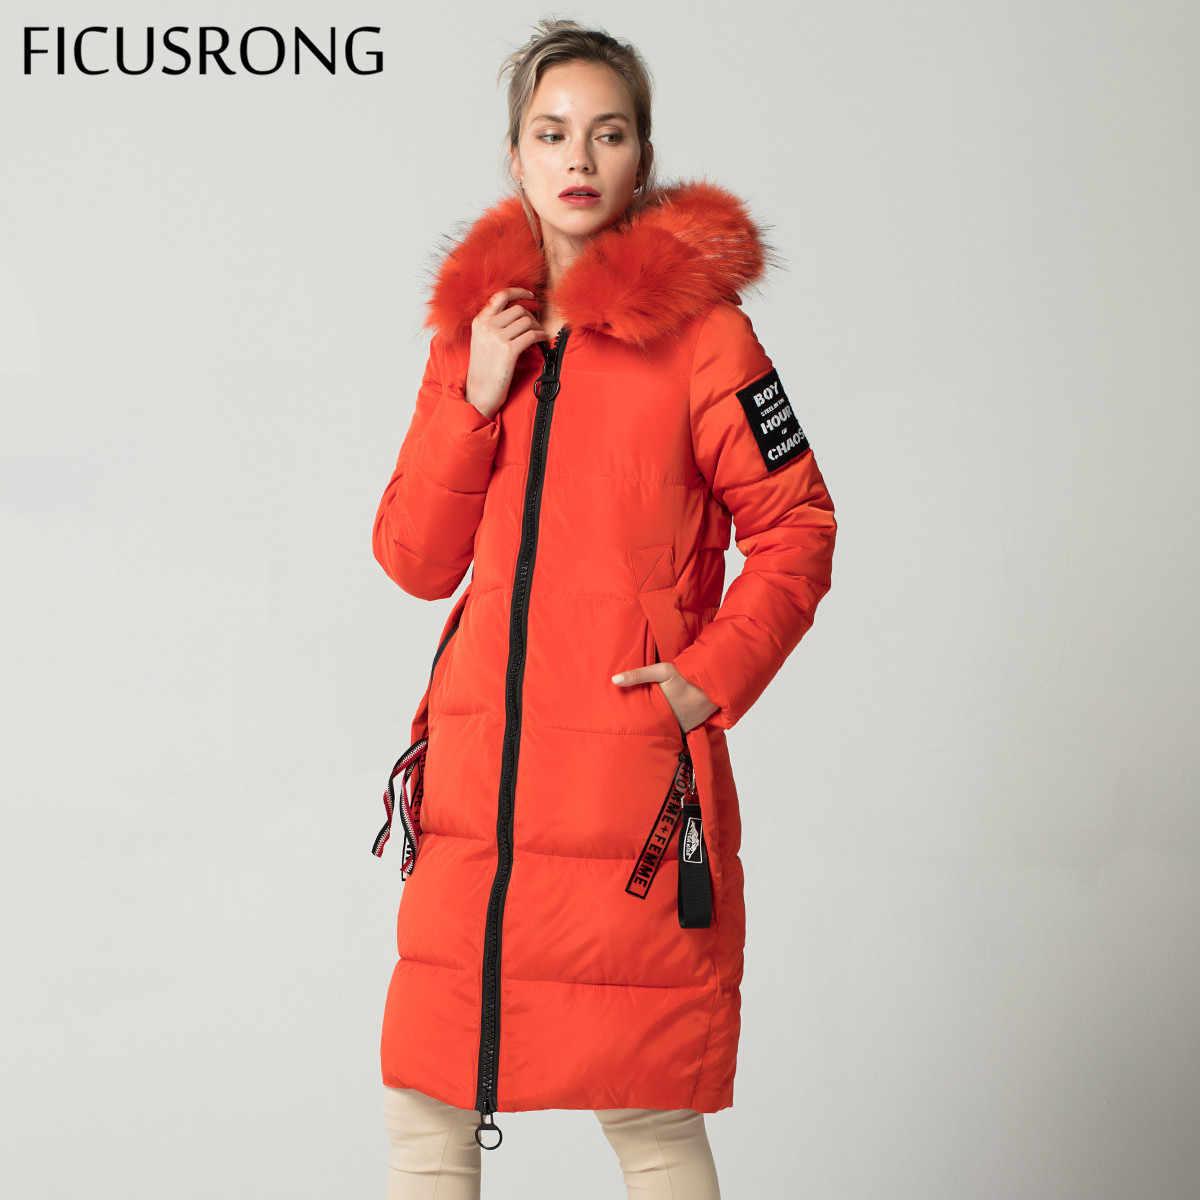 Chaqueta de invierno larga casual naranja Lisa para mujer, chaqueta acolchada ajustada para mujer, Parkas con capucha de invierno para mujer, abrigo de piel cálido FICUSRONG